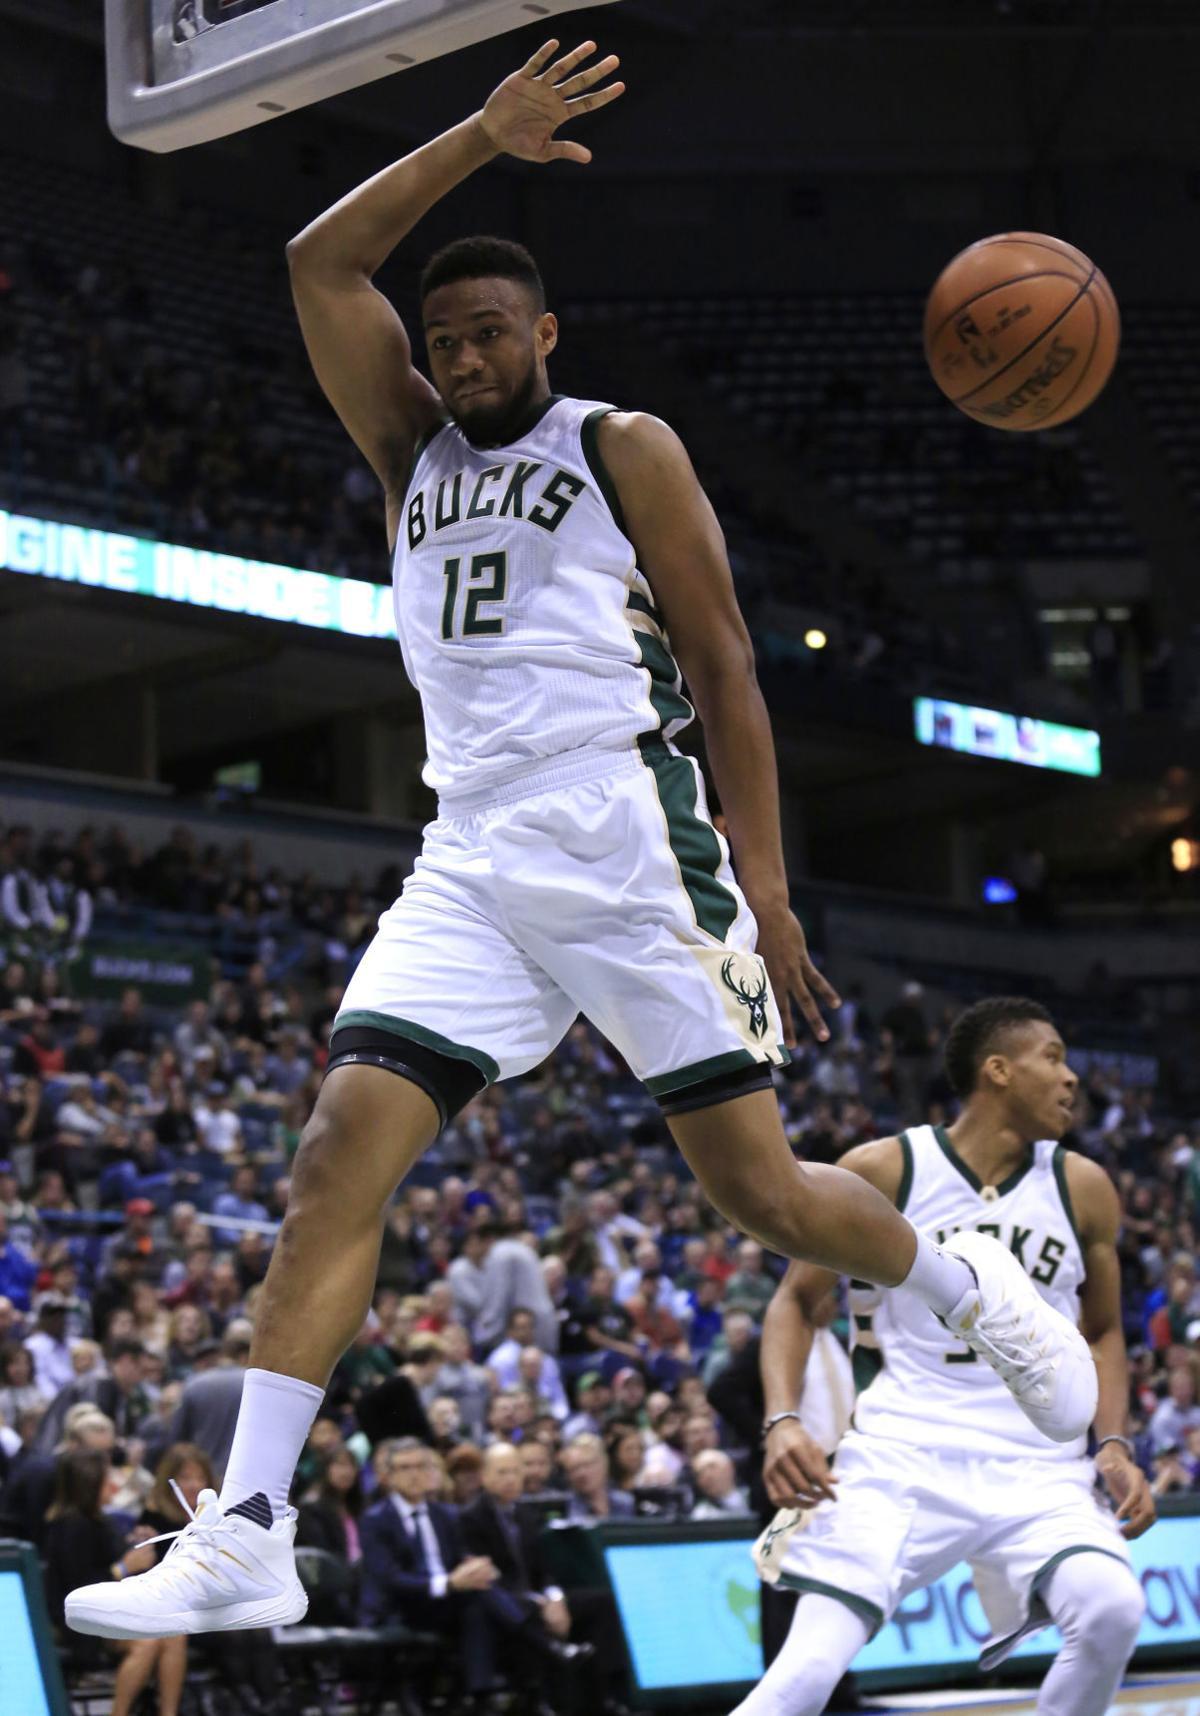 Bucks: Giannis Antetokounmpo, Jabari Parker spur win over ... Jabari Parker Shooting